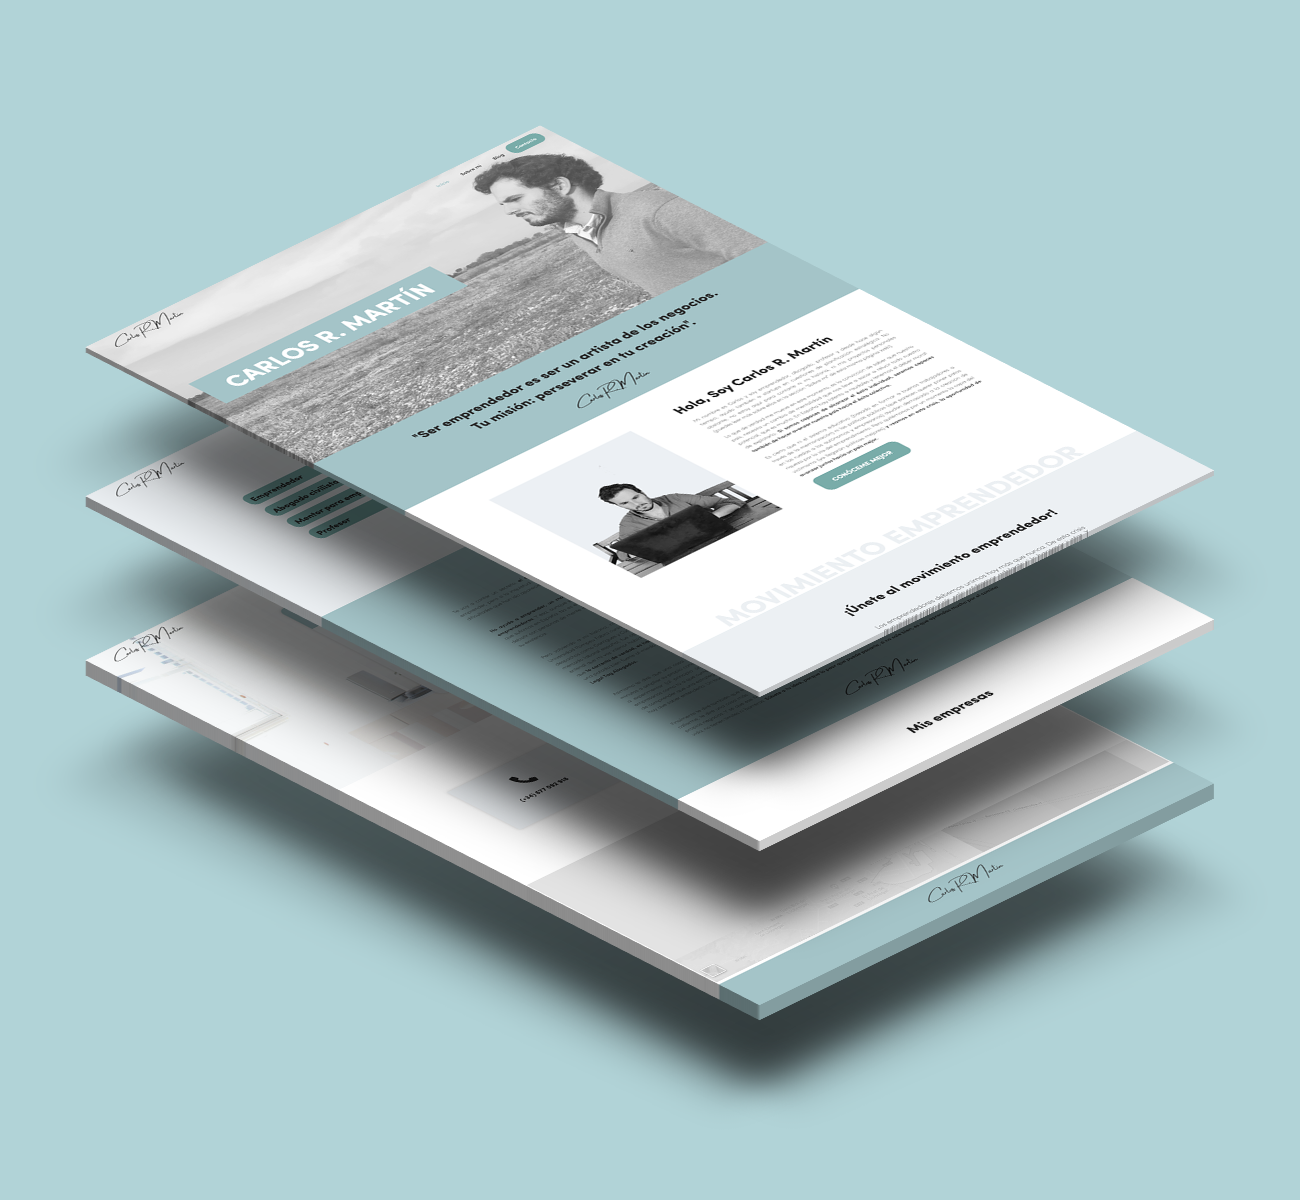 Diseño Web Carlos R. Martin